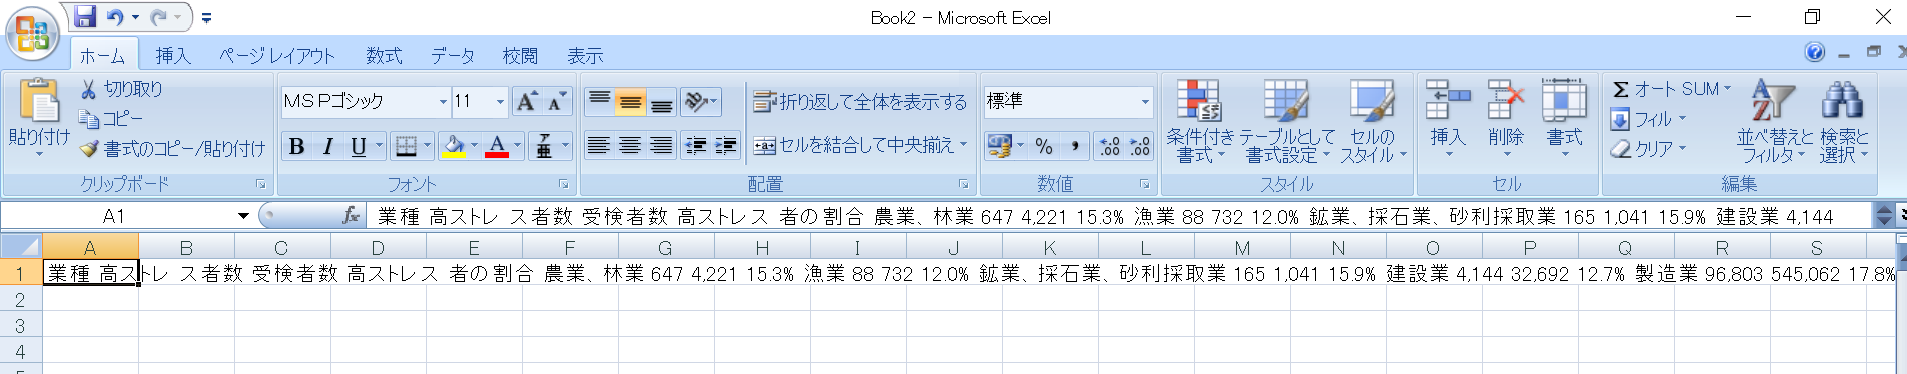 pdf_copy2excel.png